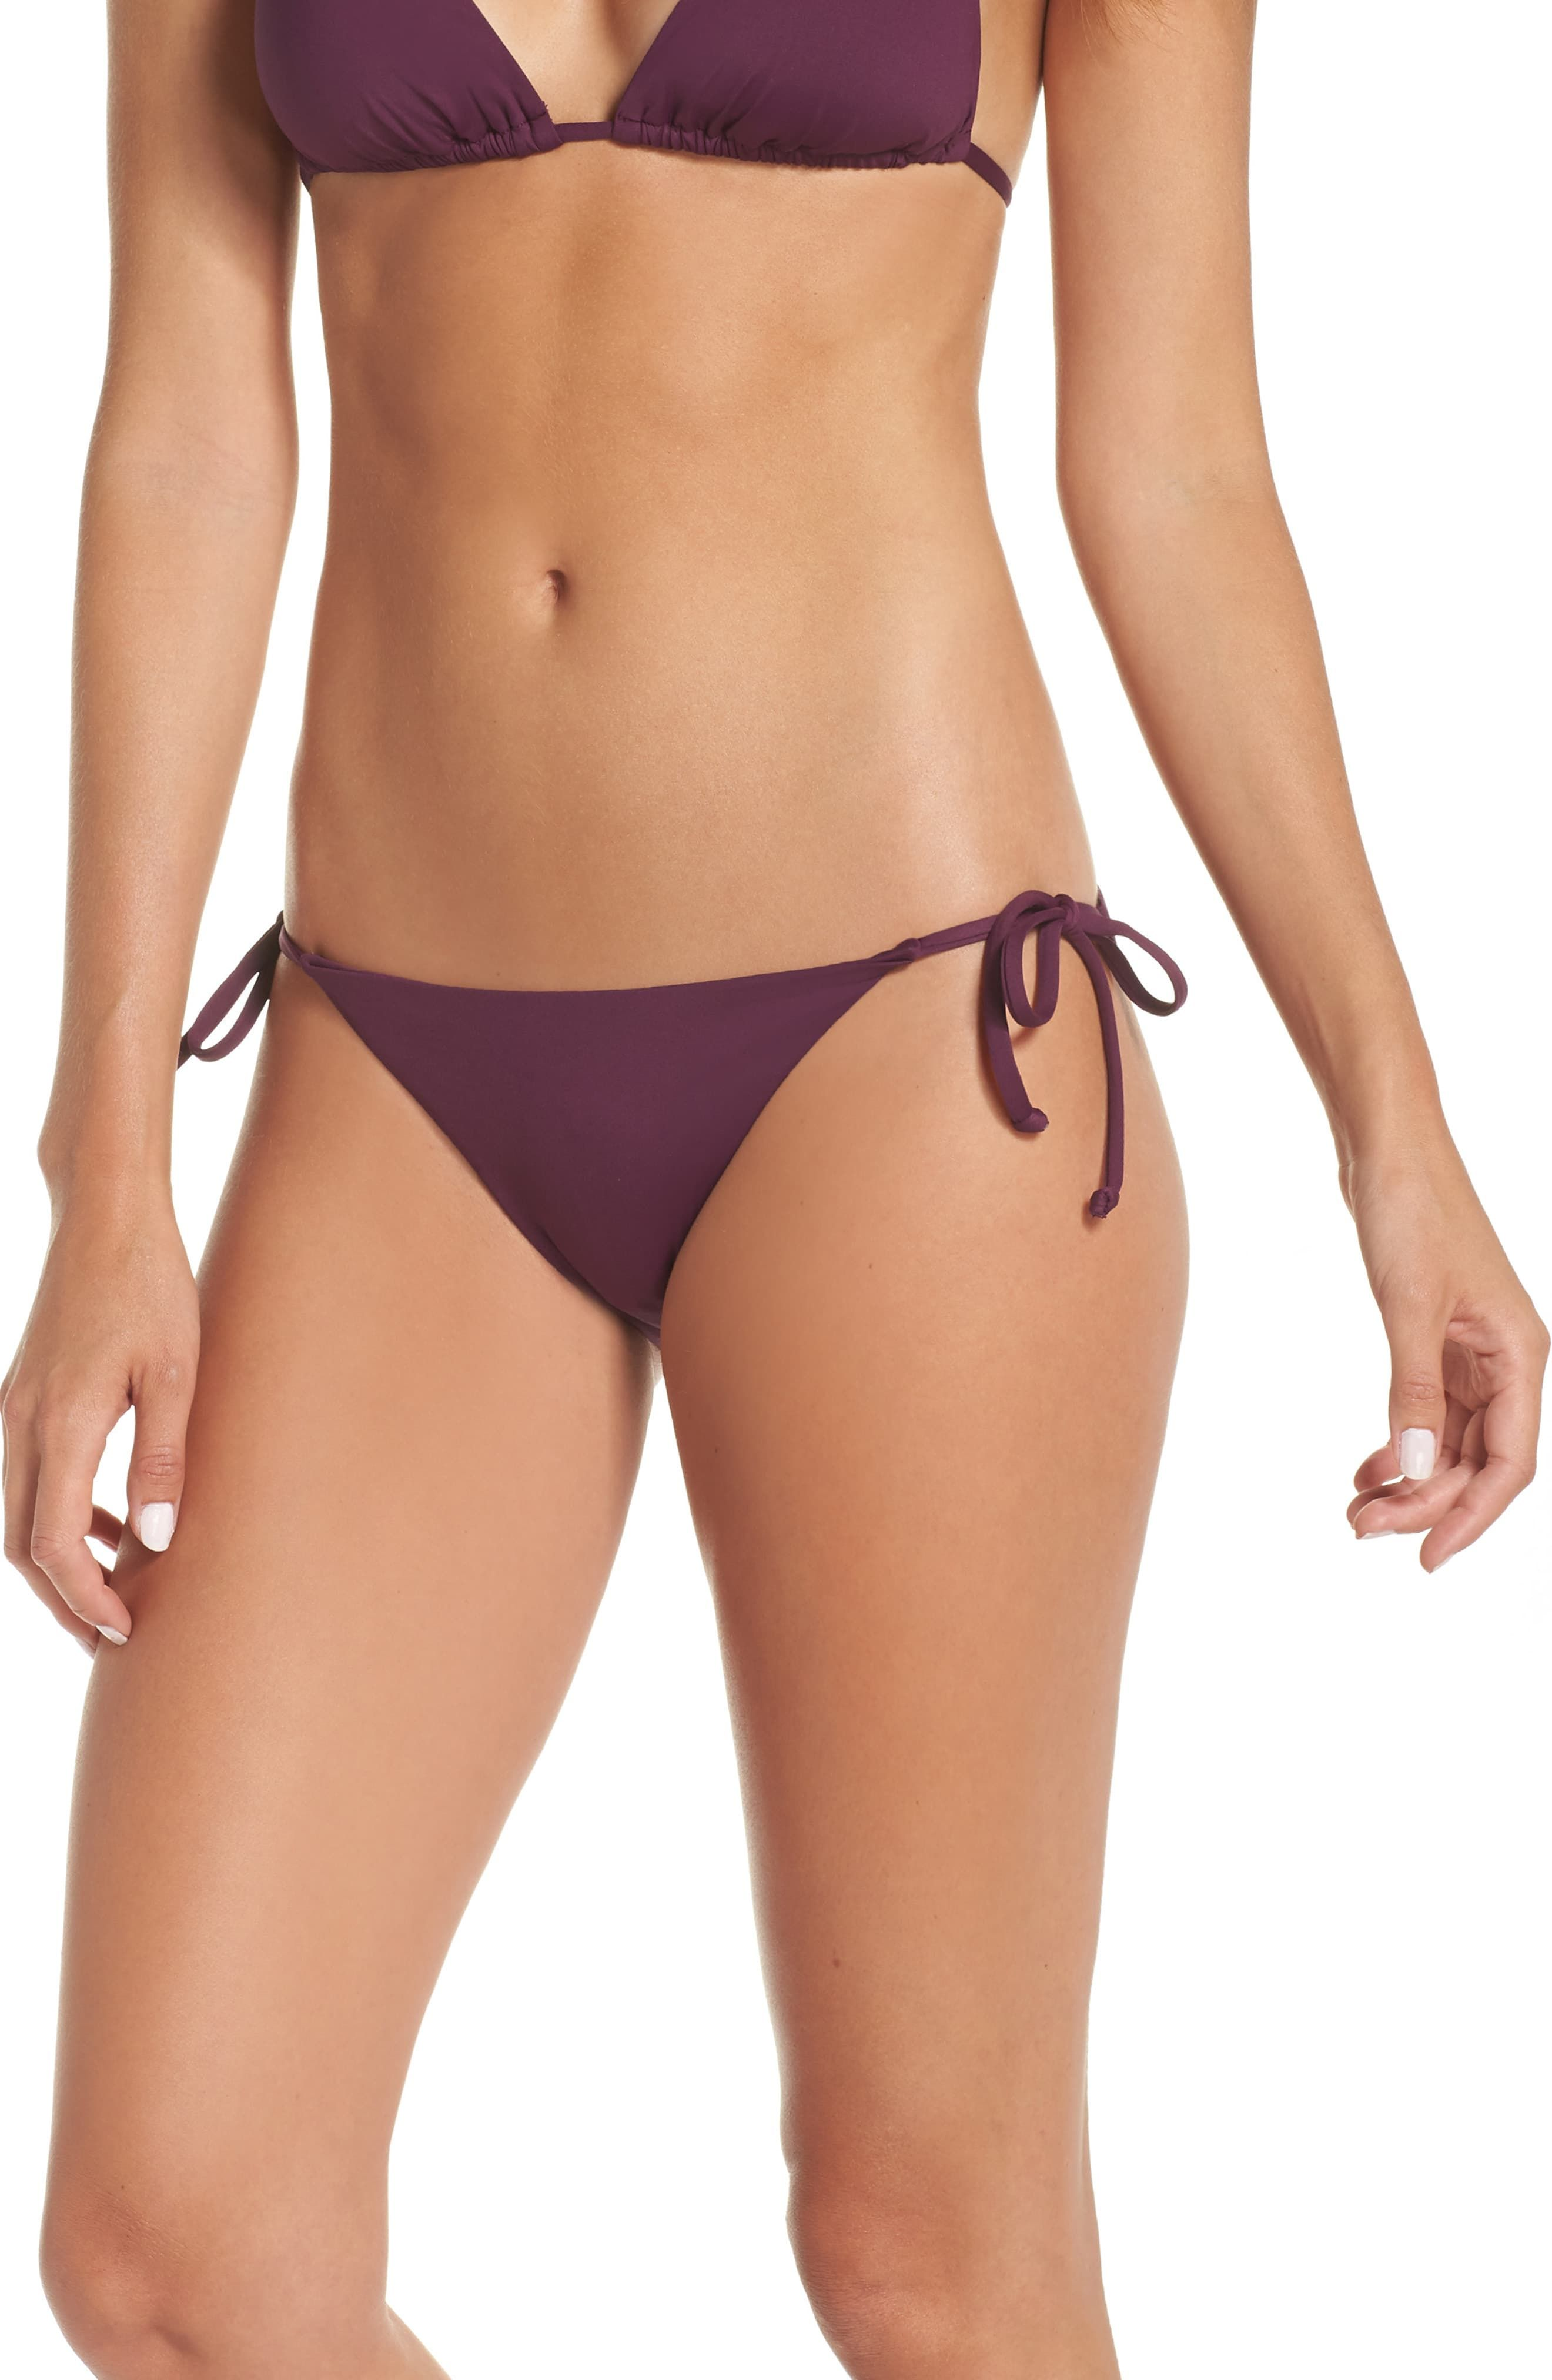 Out from Under Side Tie Scrunch Back Bikini Bottom in Burgundy